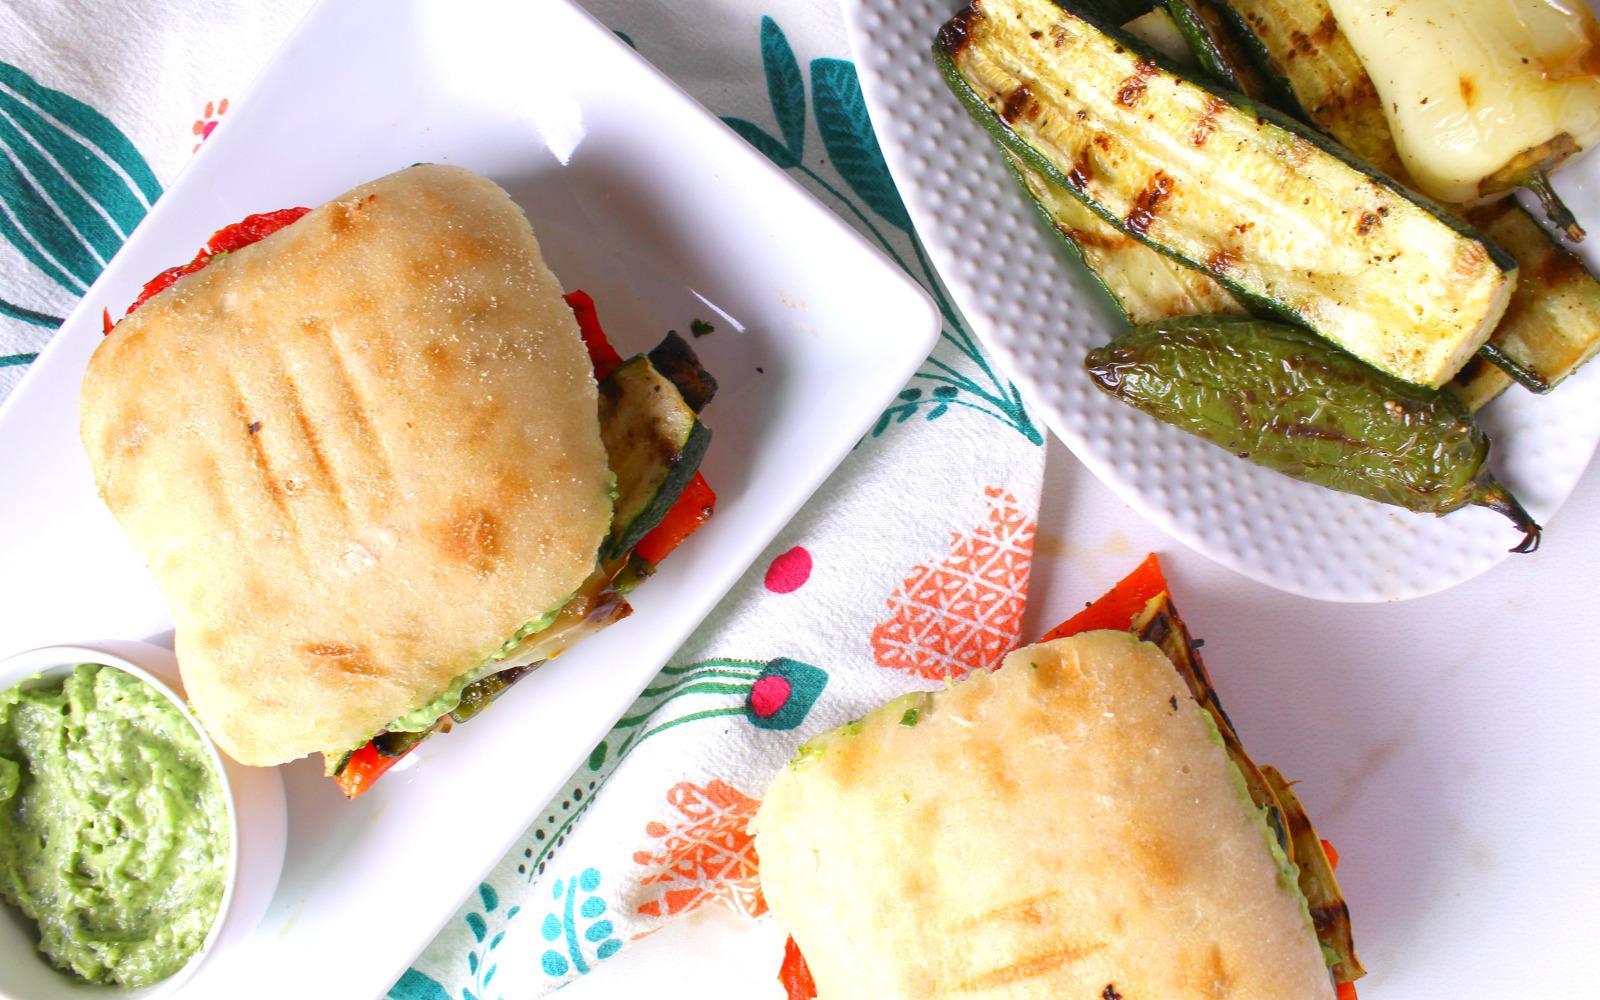 Grilled Veggie Sandwich With Basil Aioli [Vegan, Gluten-Free]